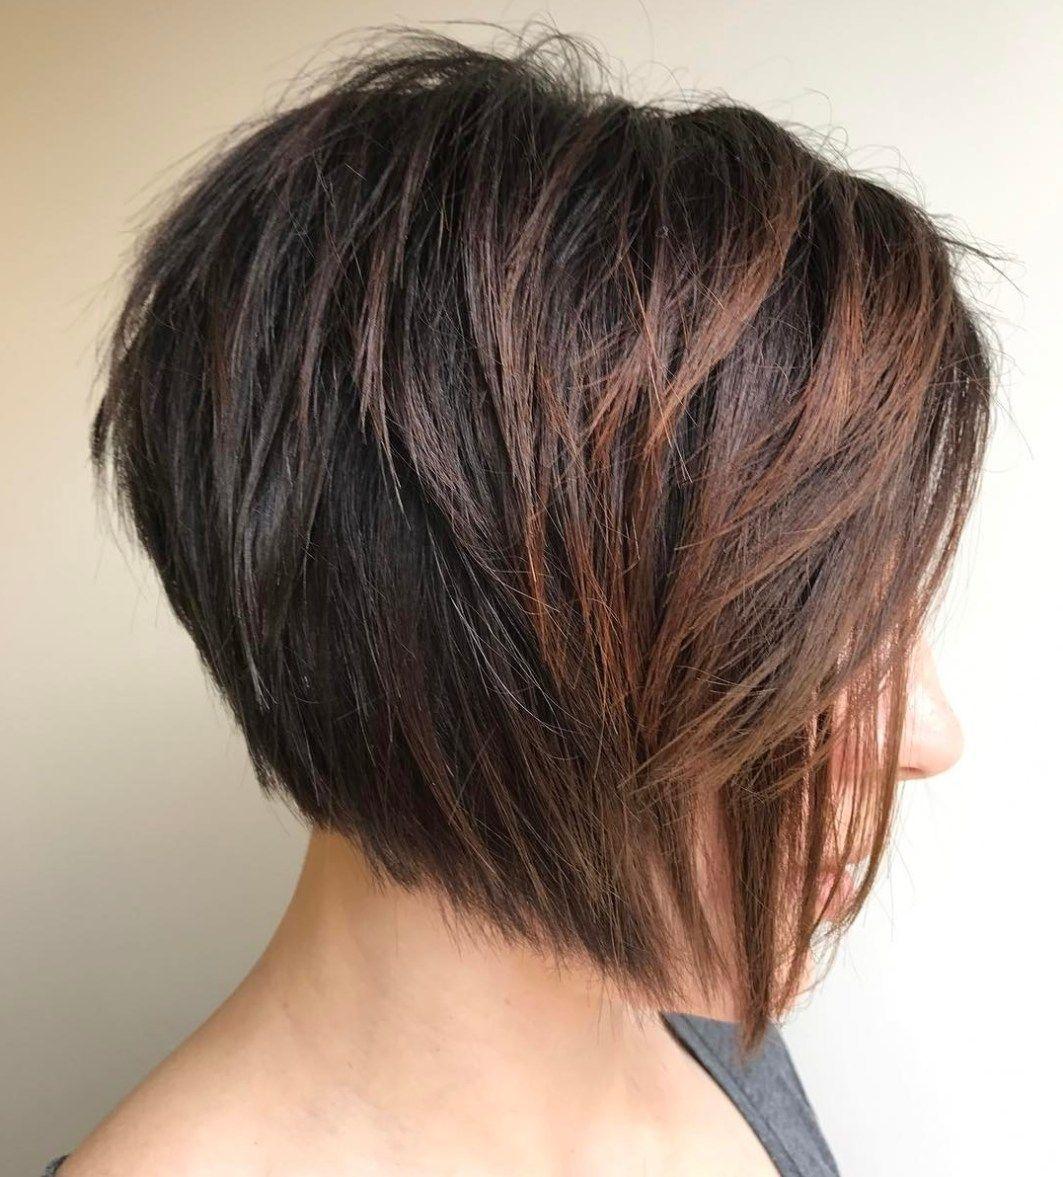 14+ Pics of short haircuts trends